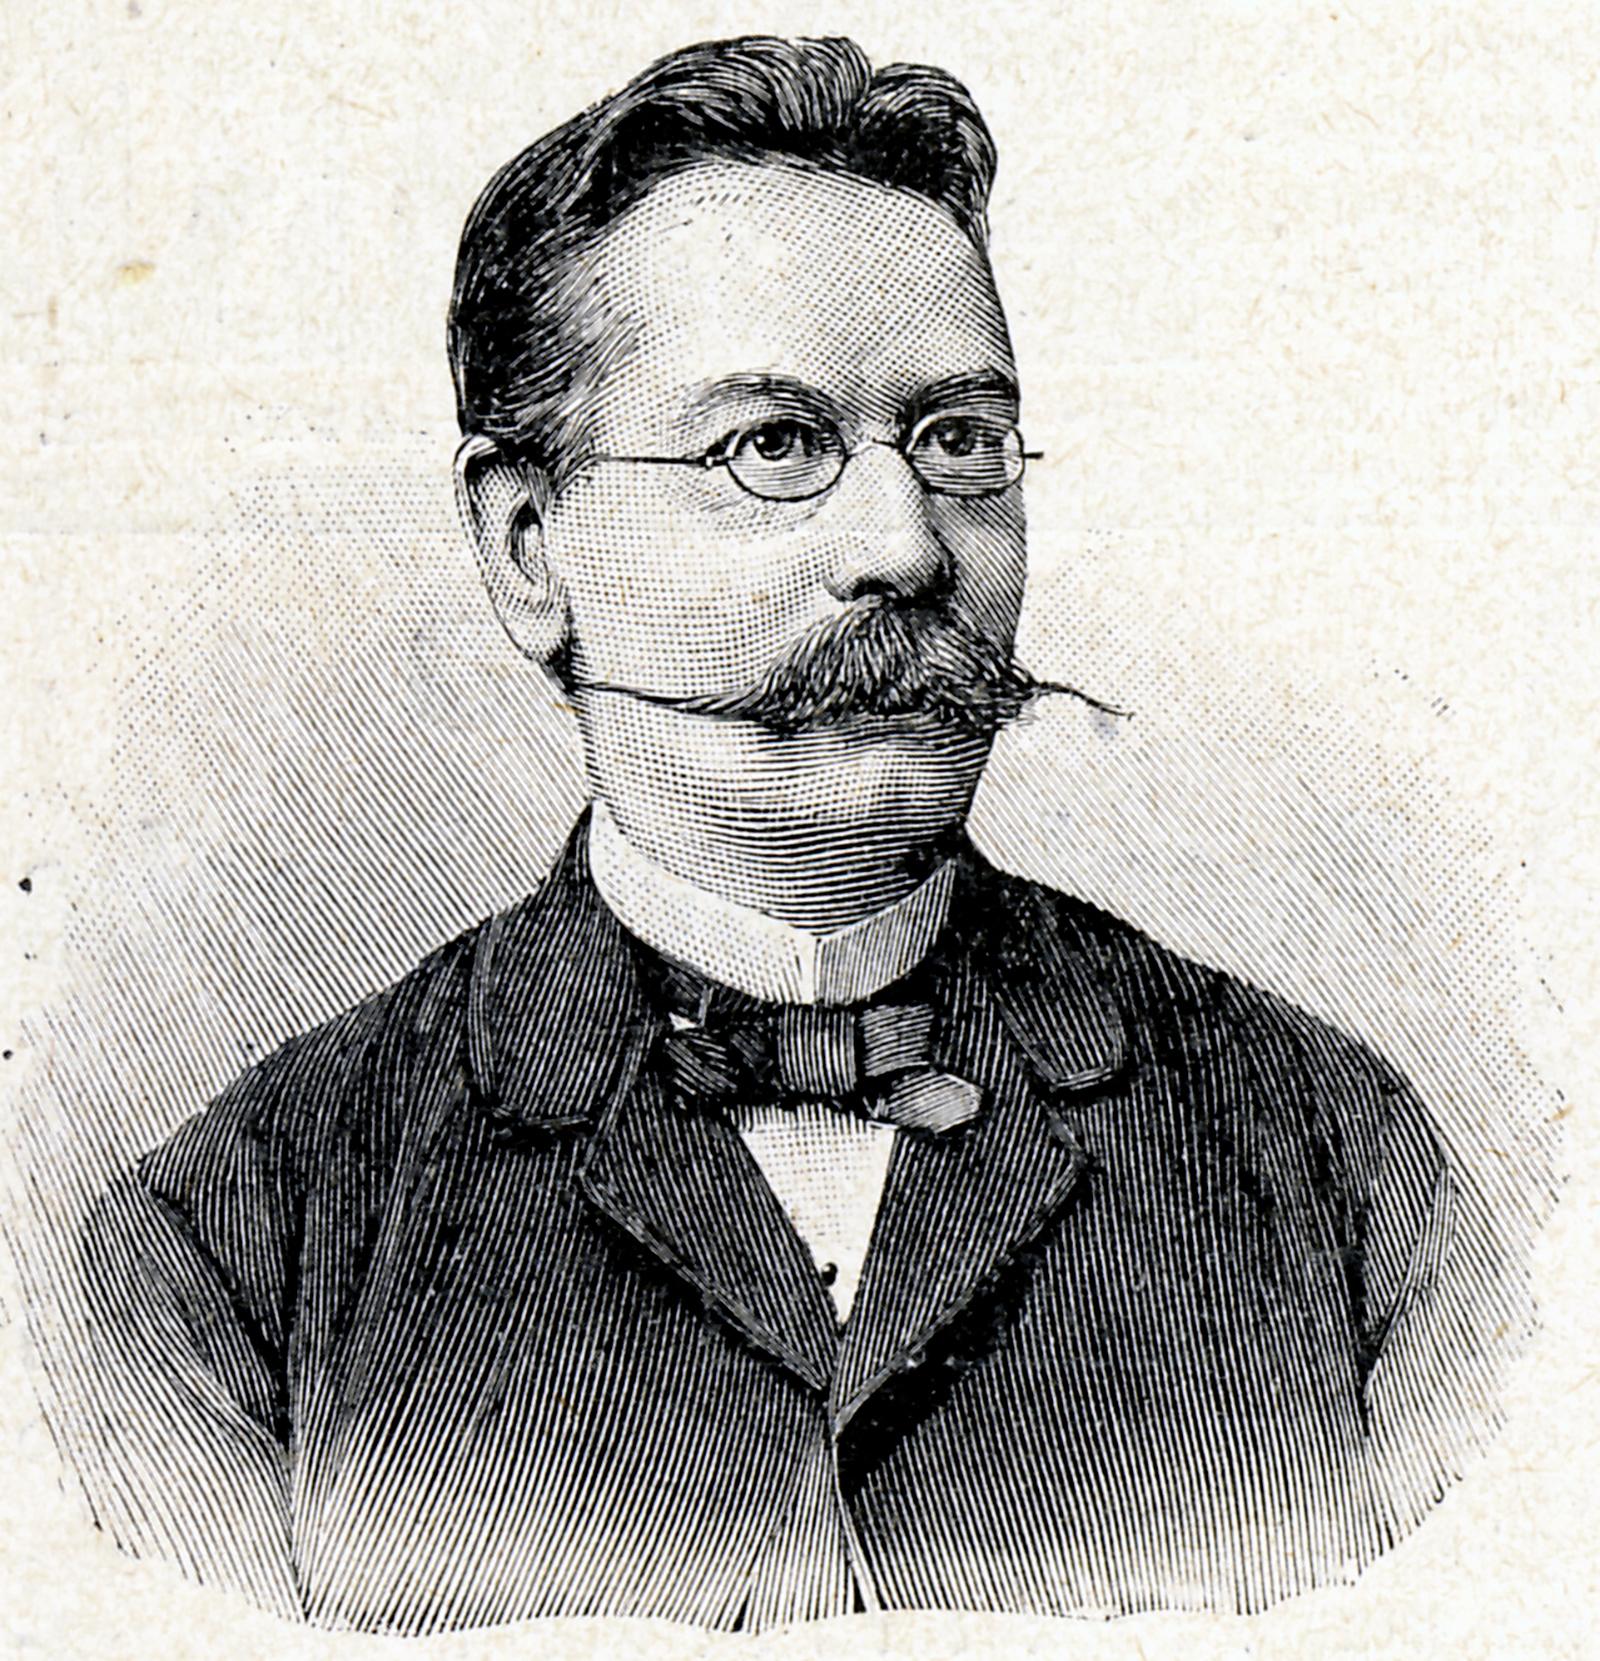 Erfand ein Kommunikationsmedium: Emanuel Herrmann